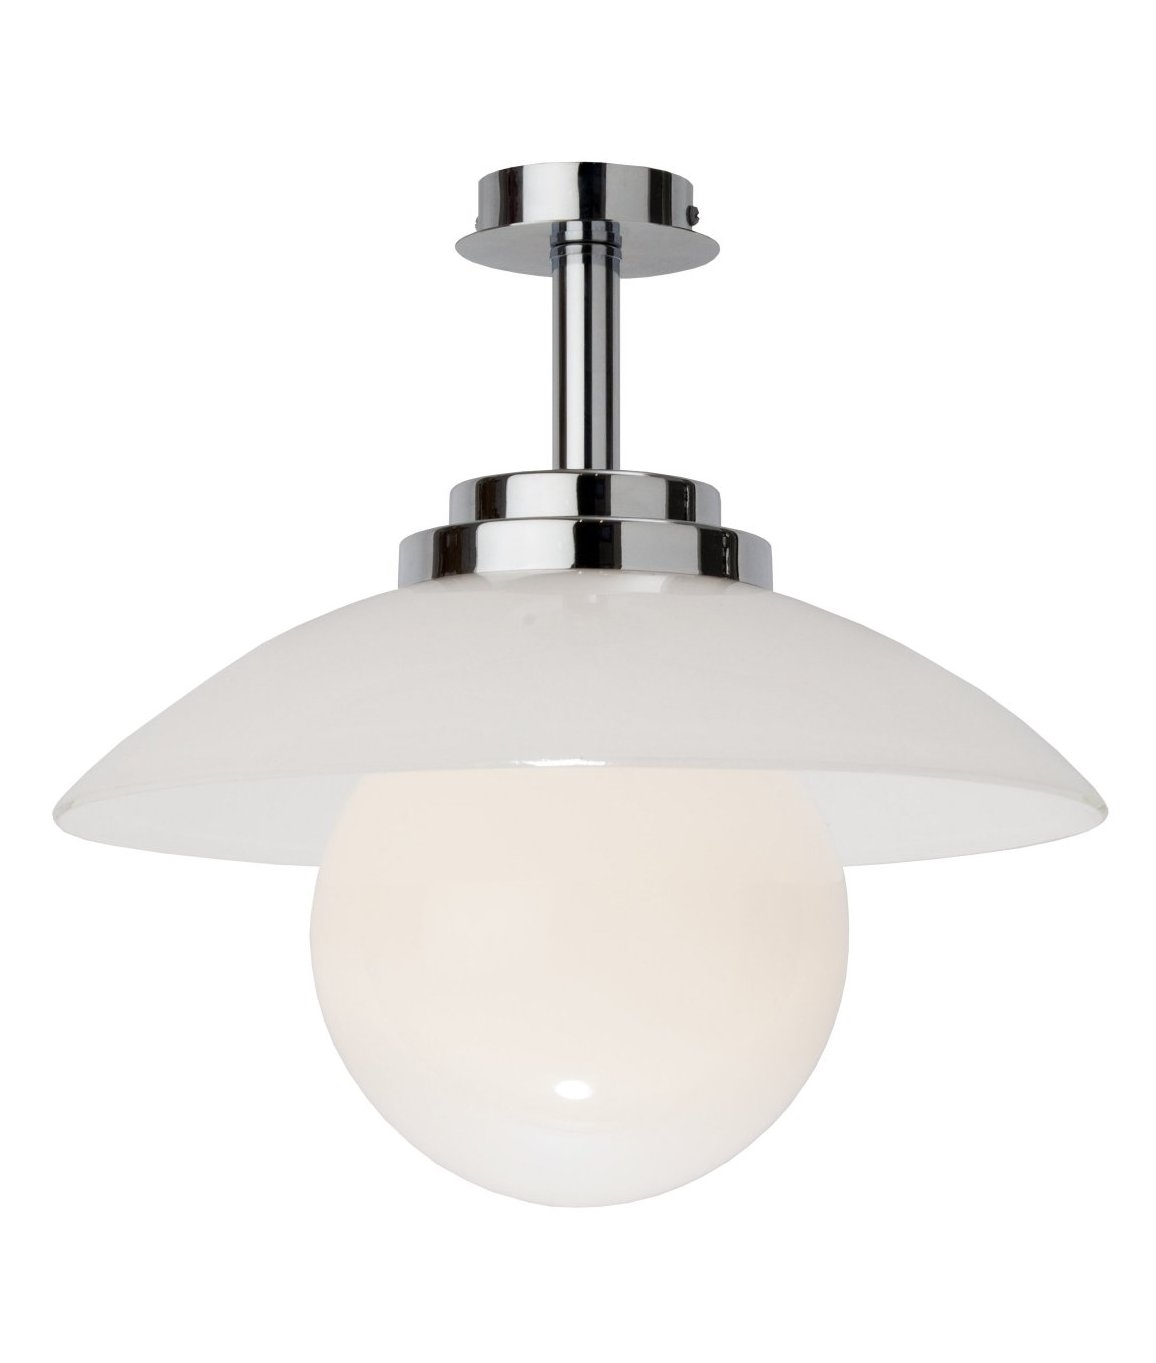 Art deco opal glass ball pendant for Art deco bathroom lighting